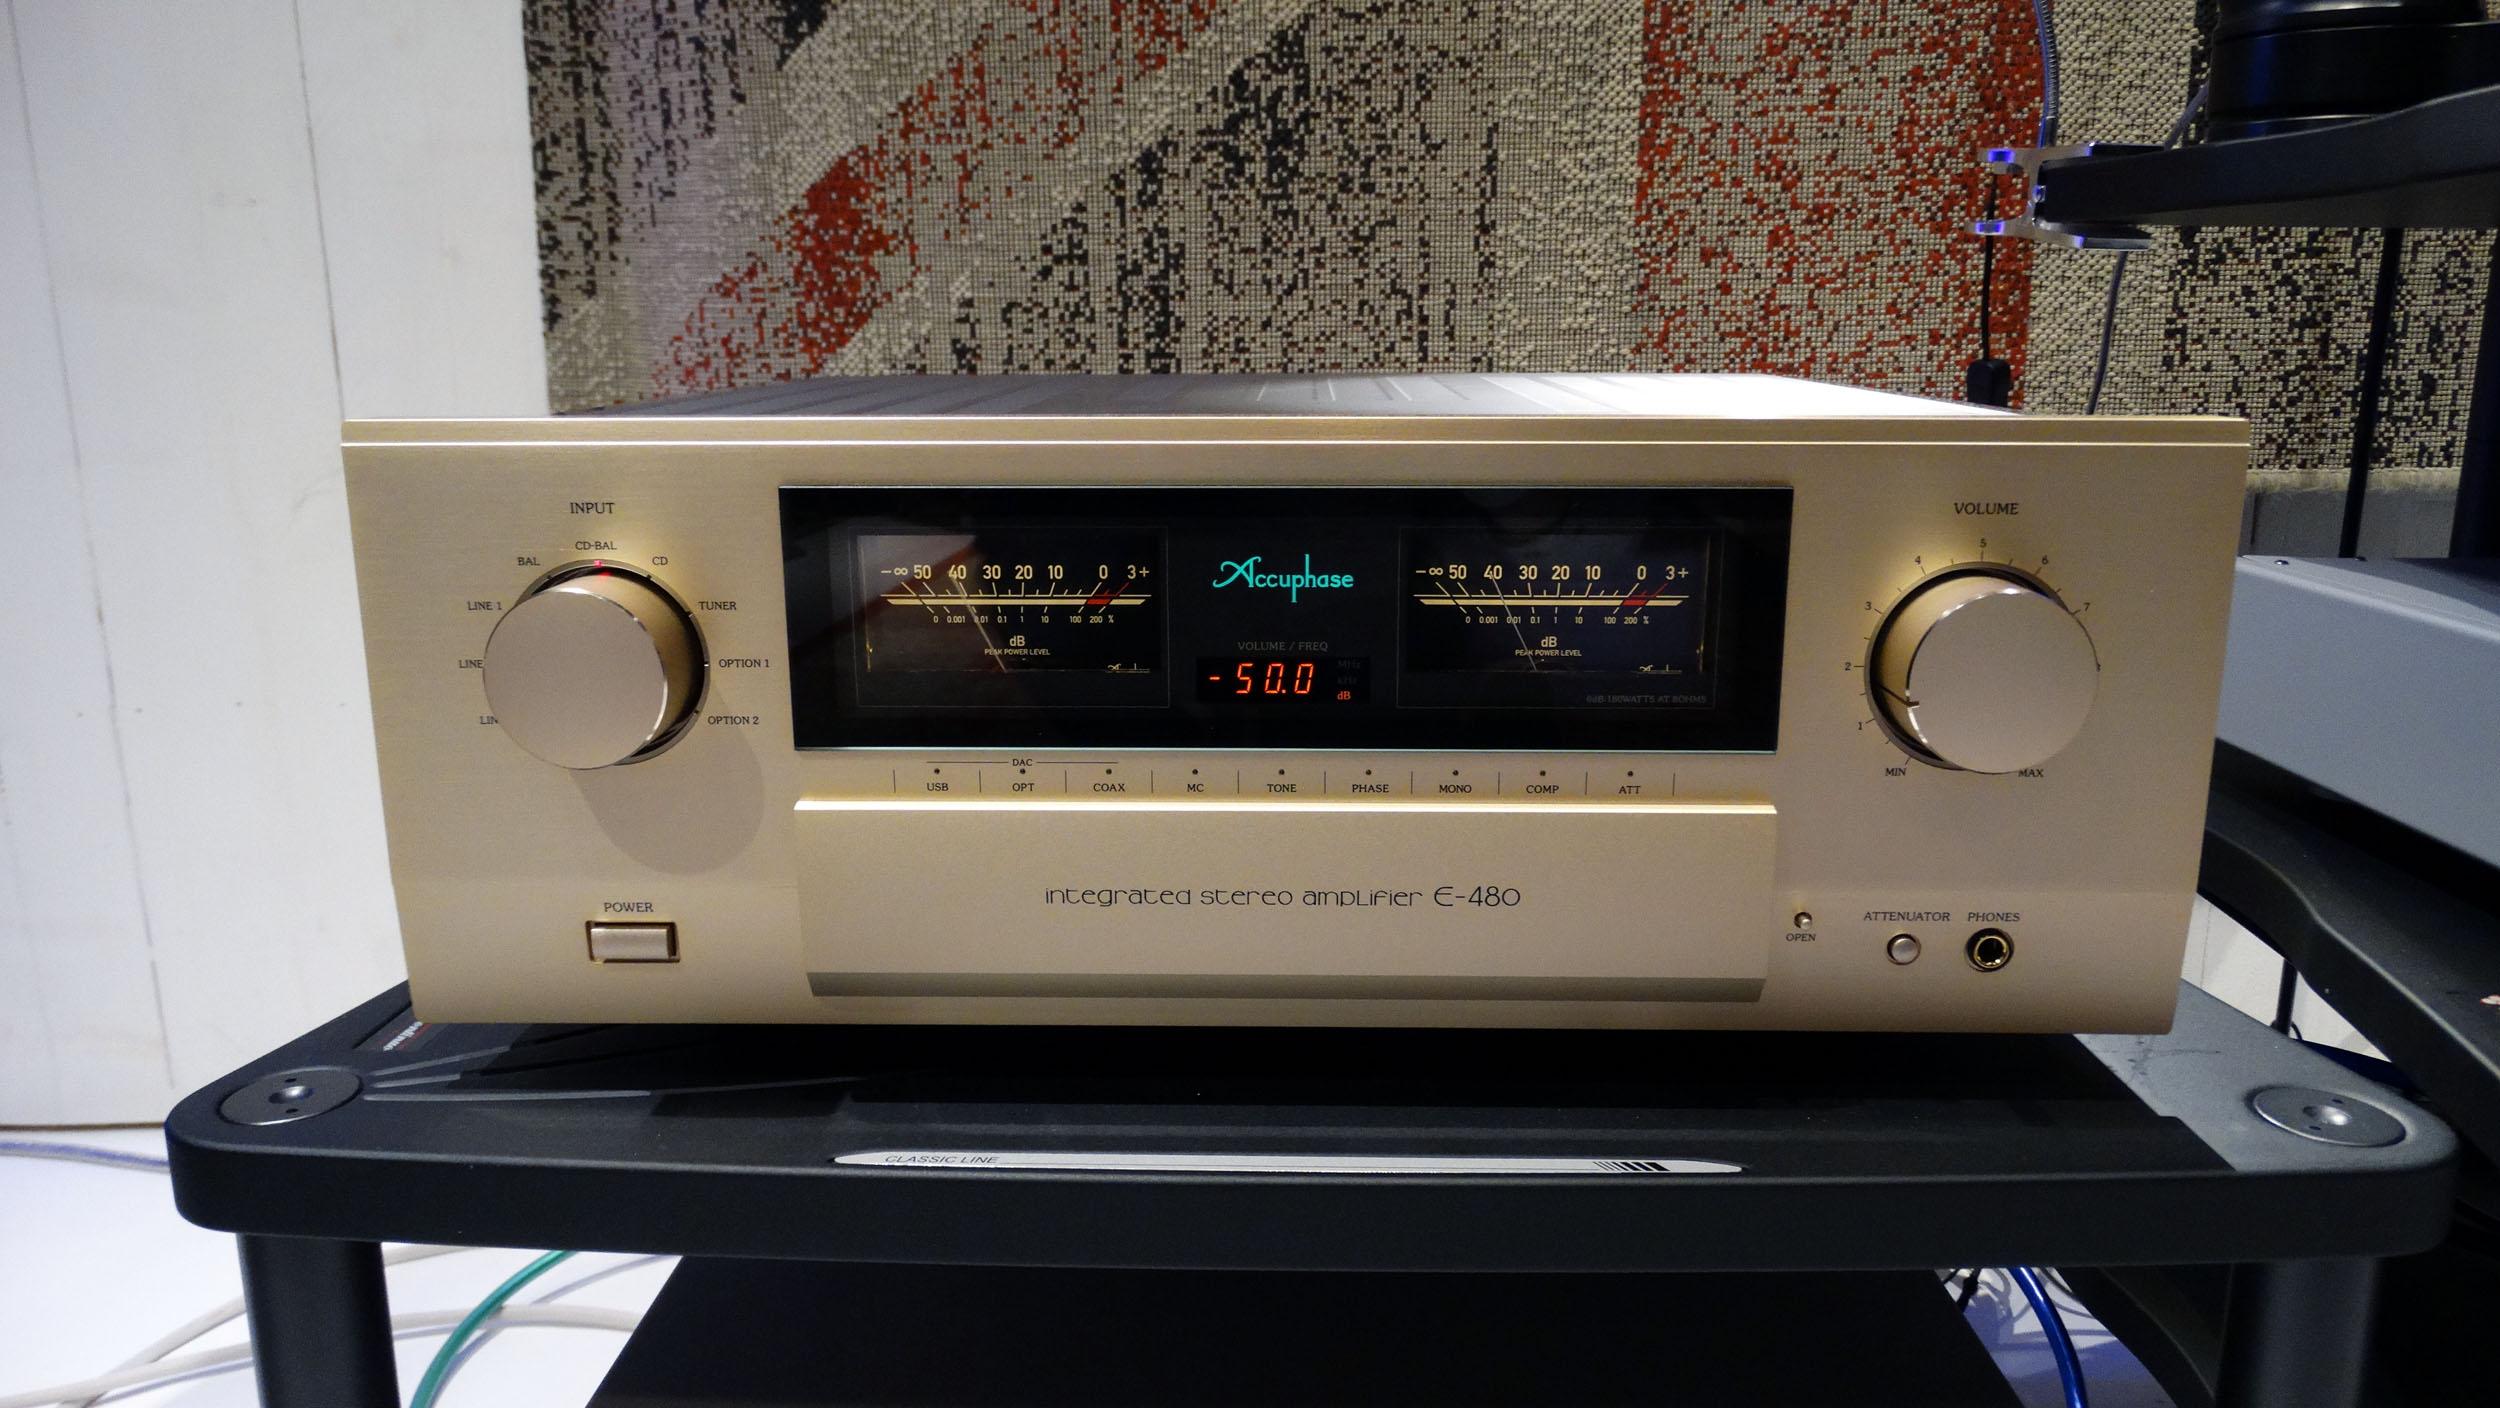 Accuphase E 480 Hans Audio 1 Nieuw binnen: Accuphase E-480